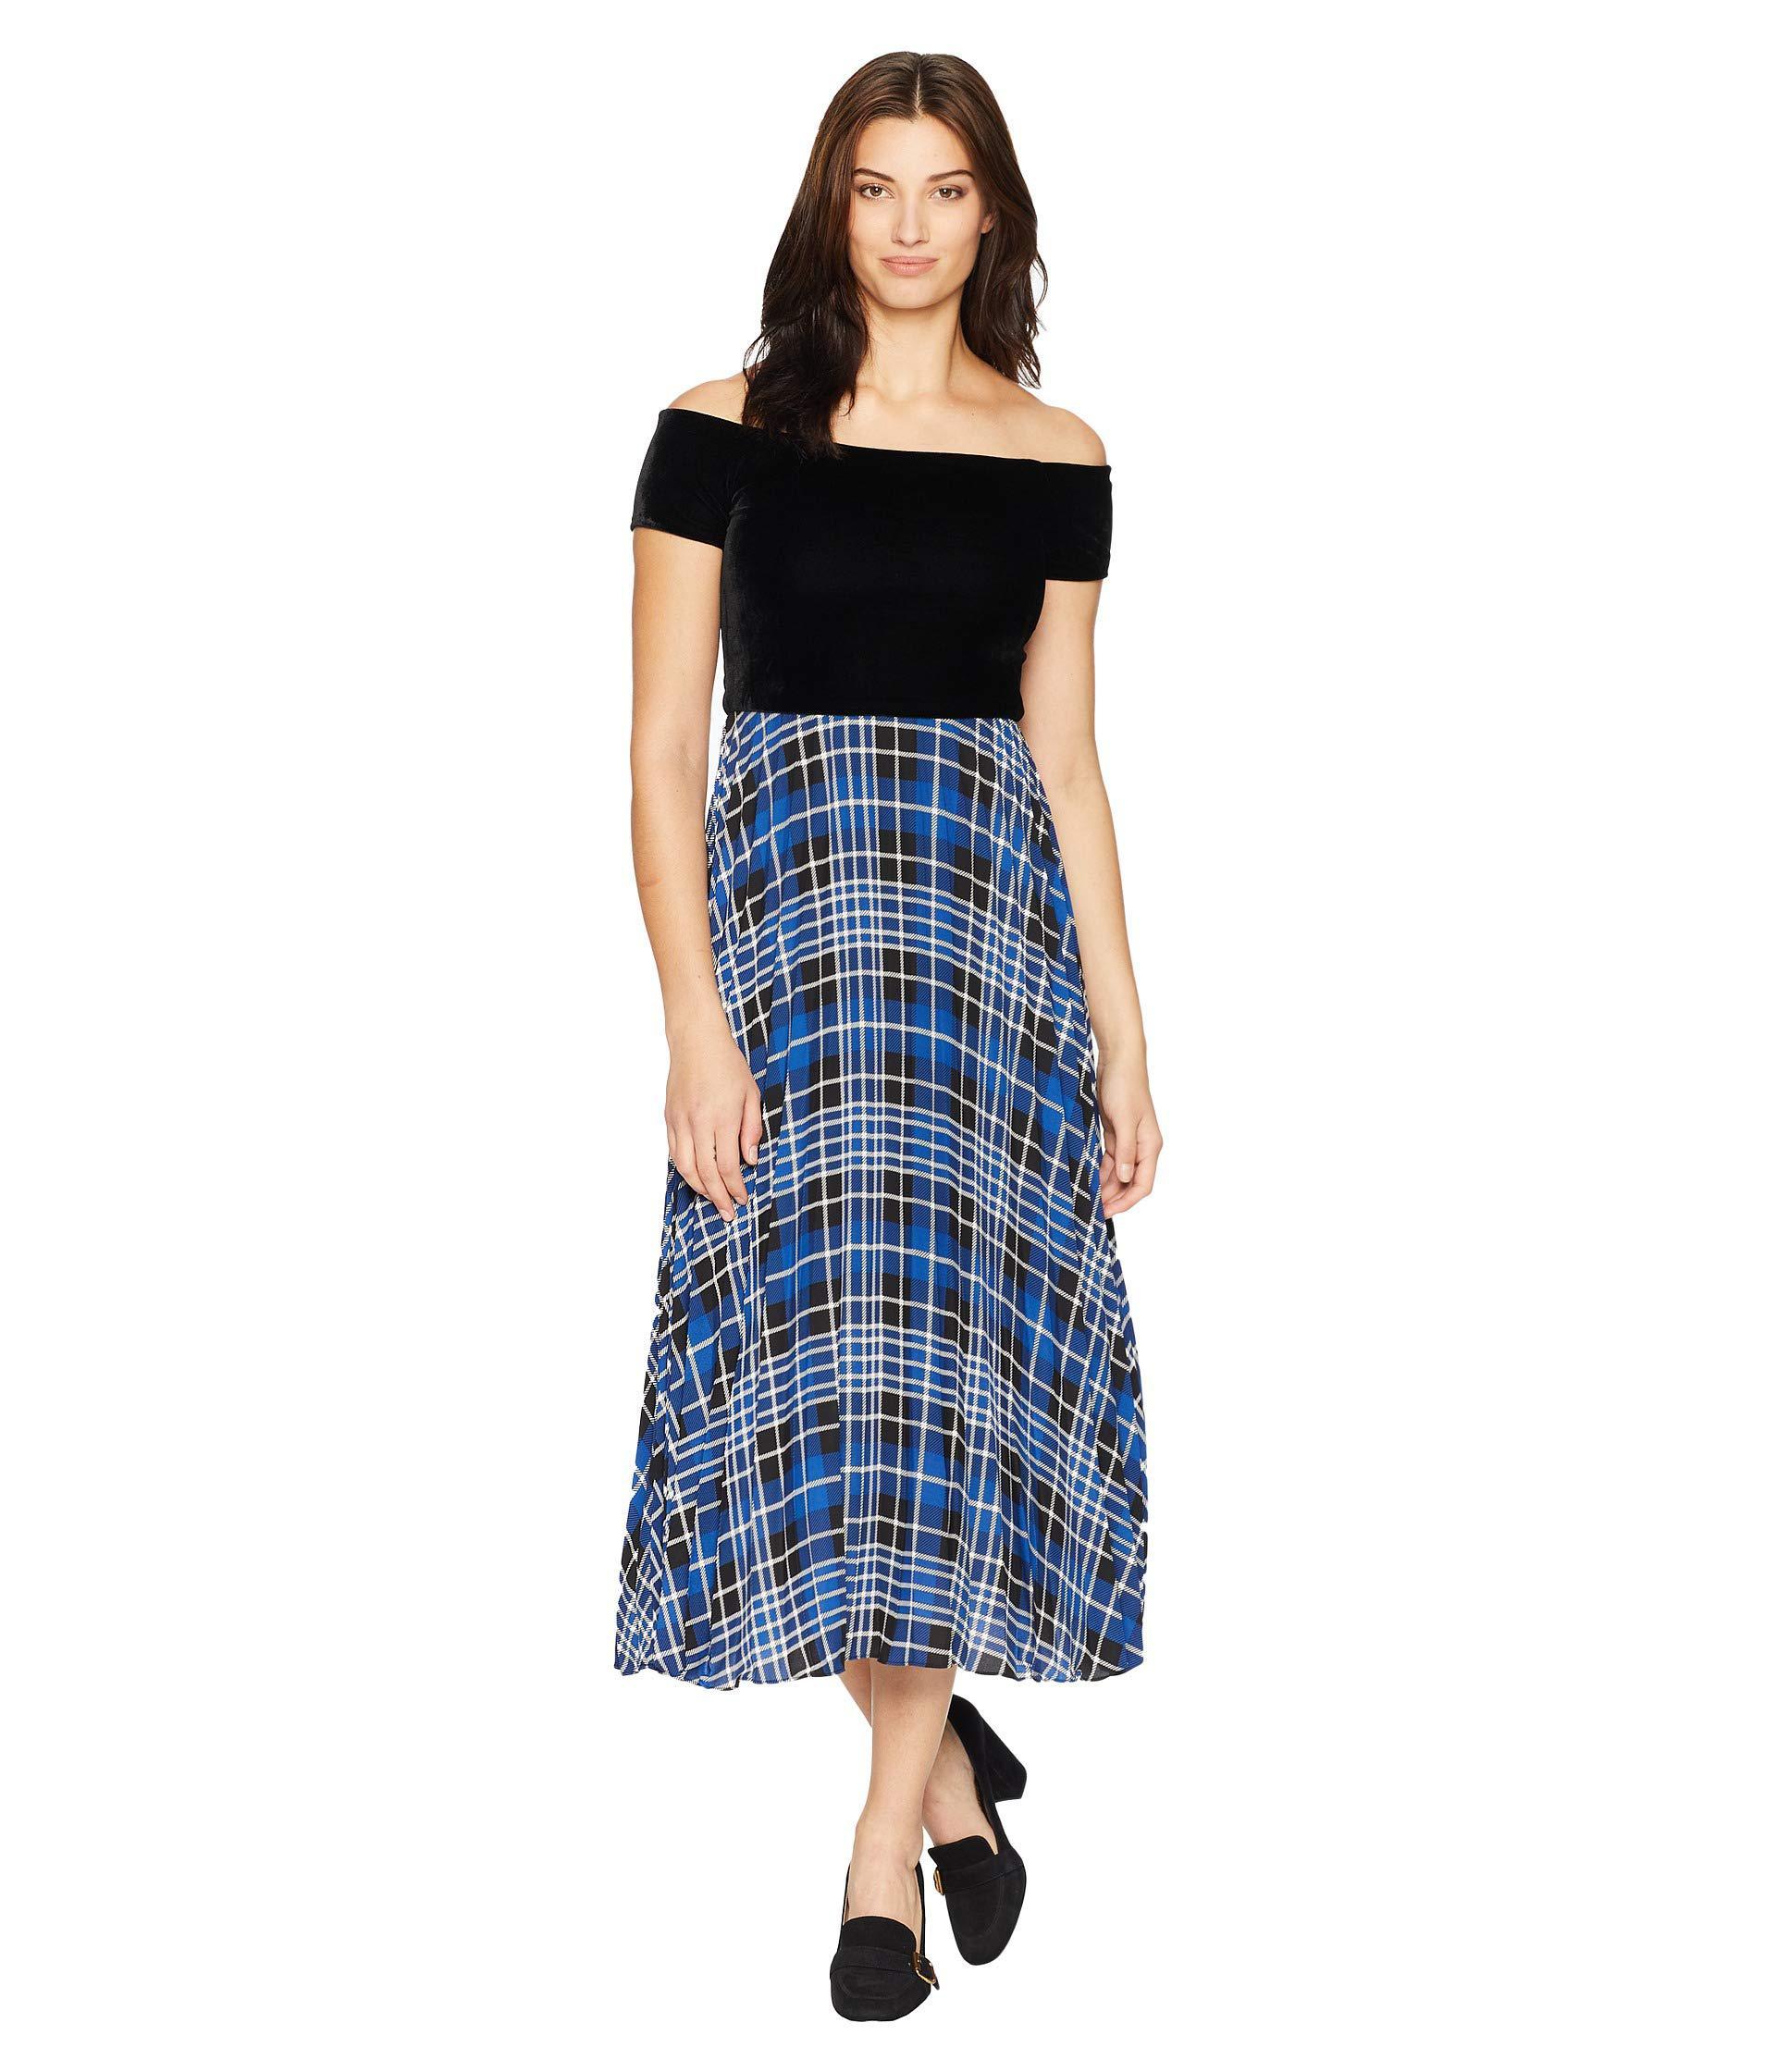 fbf155e13ca4 Lyst - Donna Morgan Off The Shoulder Midi Dress W  Pleated Skirt ...